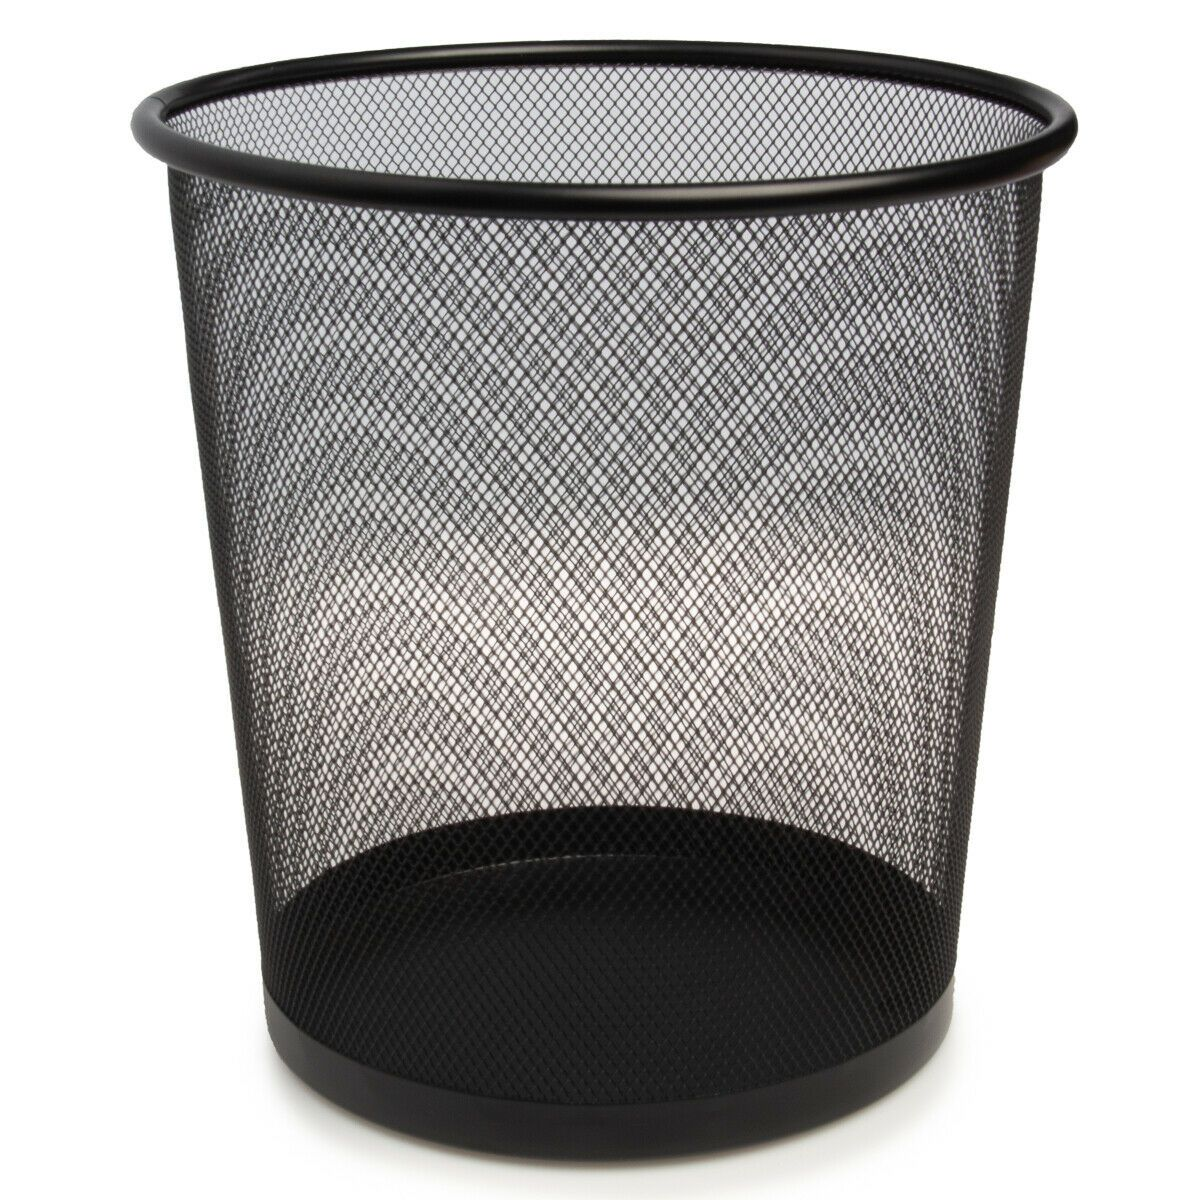 Home Office Waste Basket Small Trash Can Dorm Room Supplies Bedroom Bathroom Trash Cans Ideas Of Trash Cans Bedroom Trash Can Trash Can Bathroom Trash Can